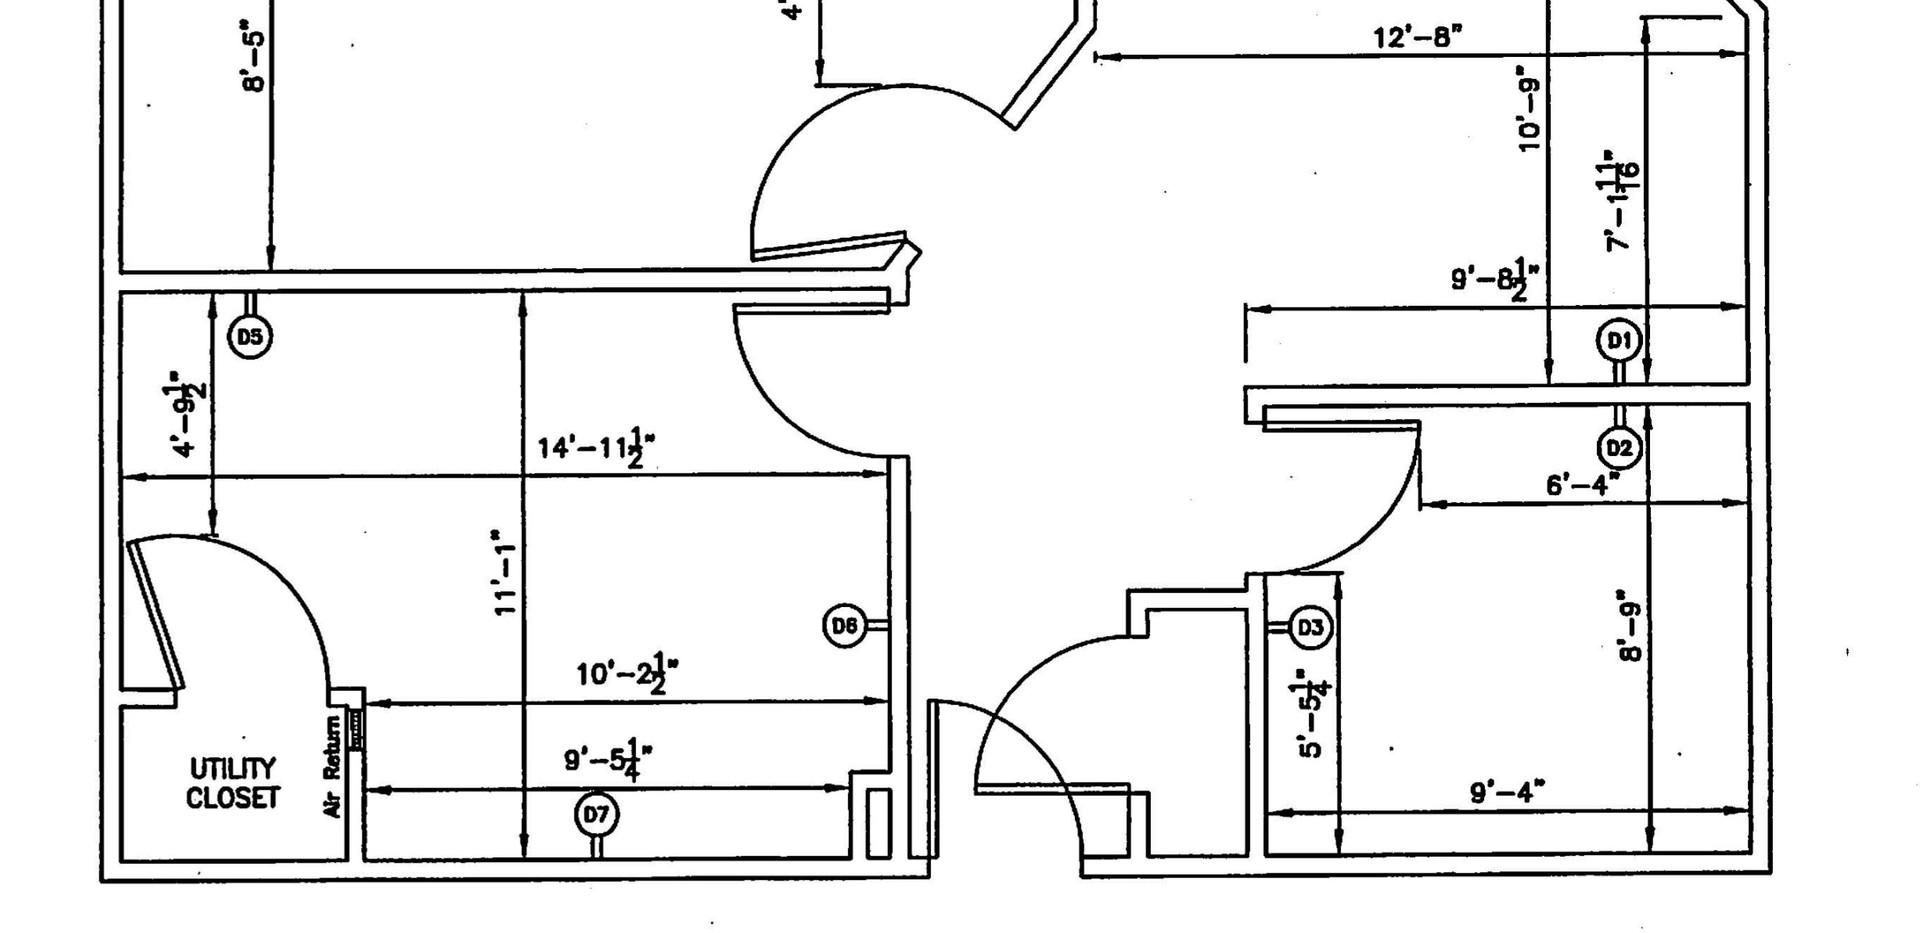 162 Danbury Road - Ground Floor Plan